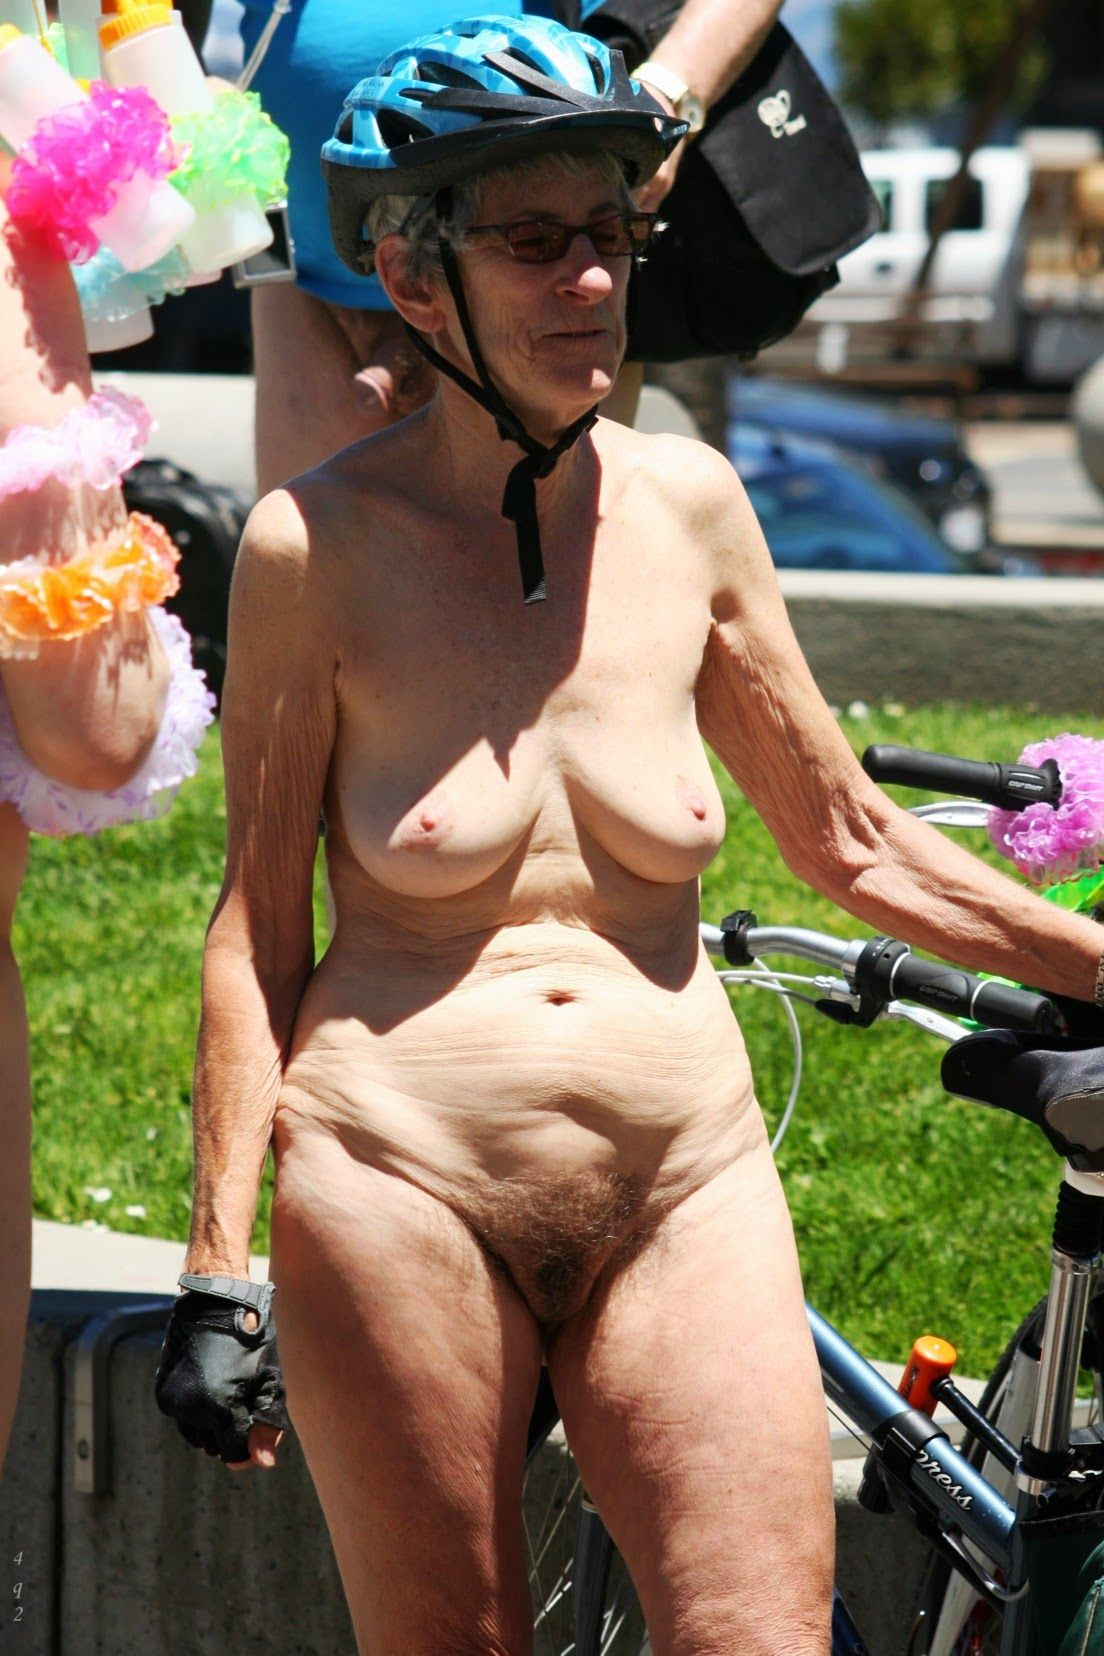 granny solo : photo   ню велосипедное   pinterest   soloing